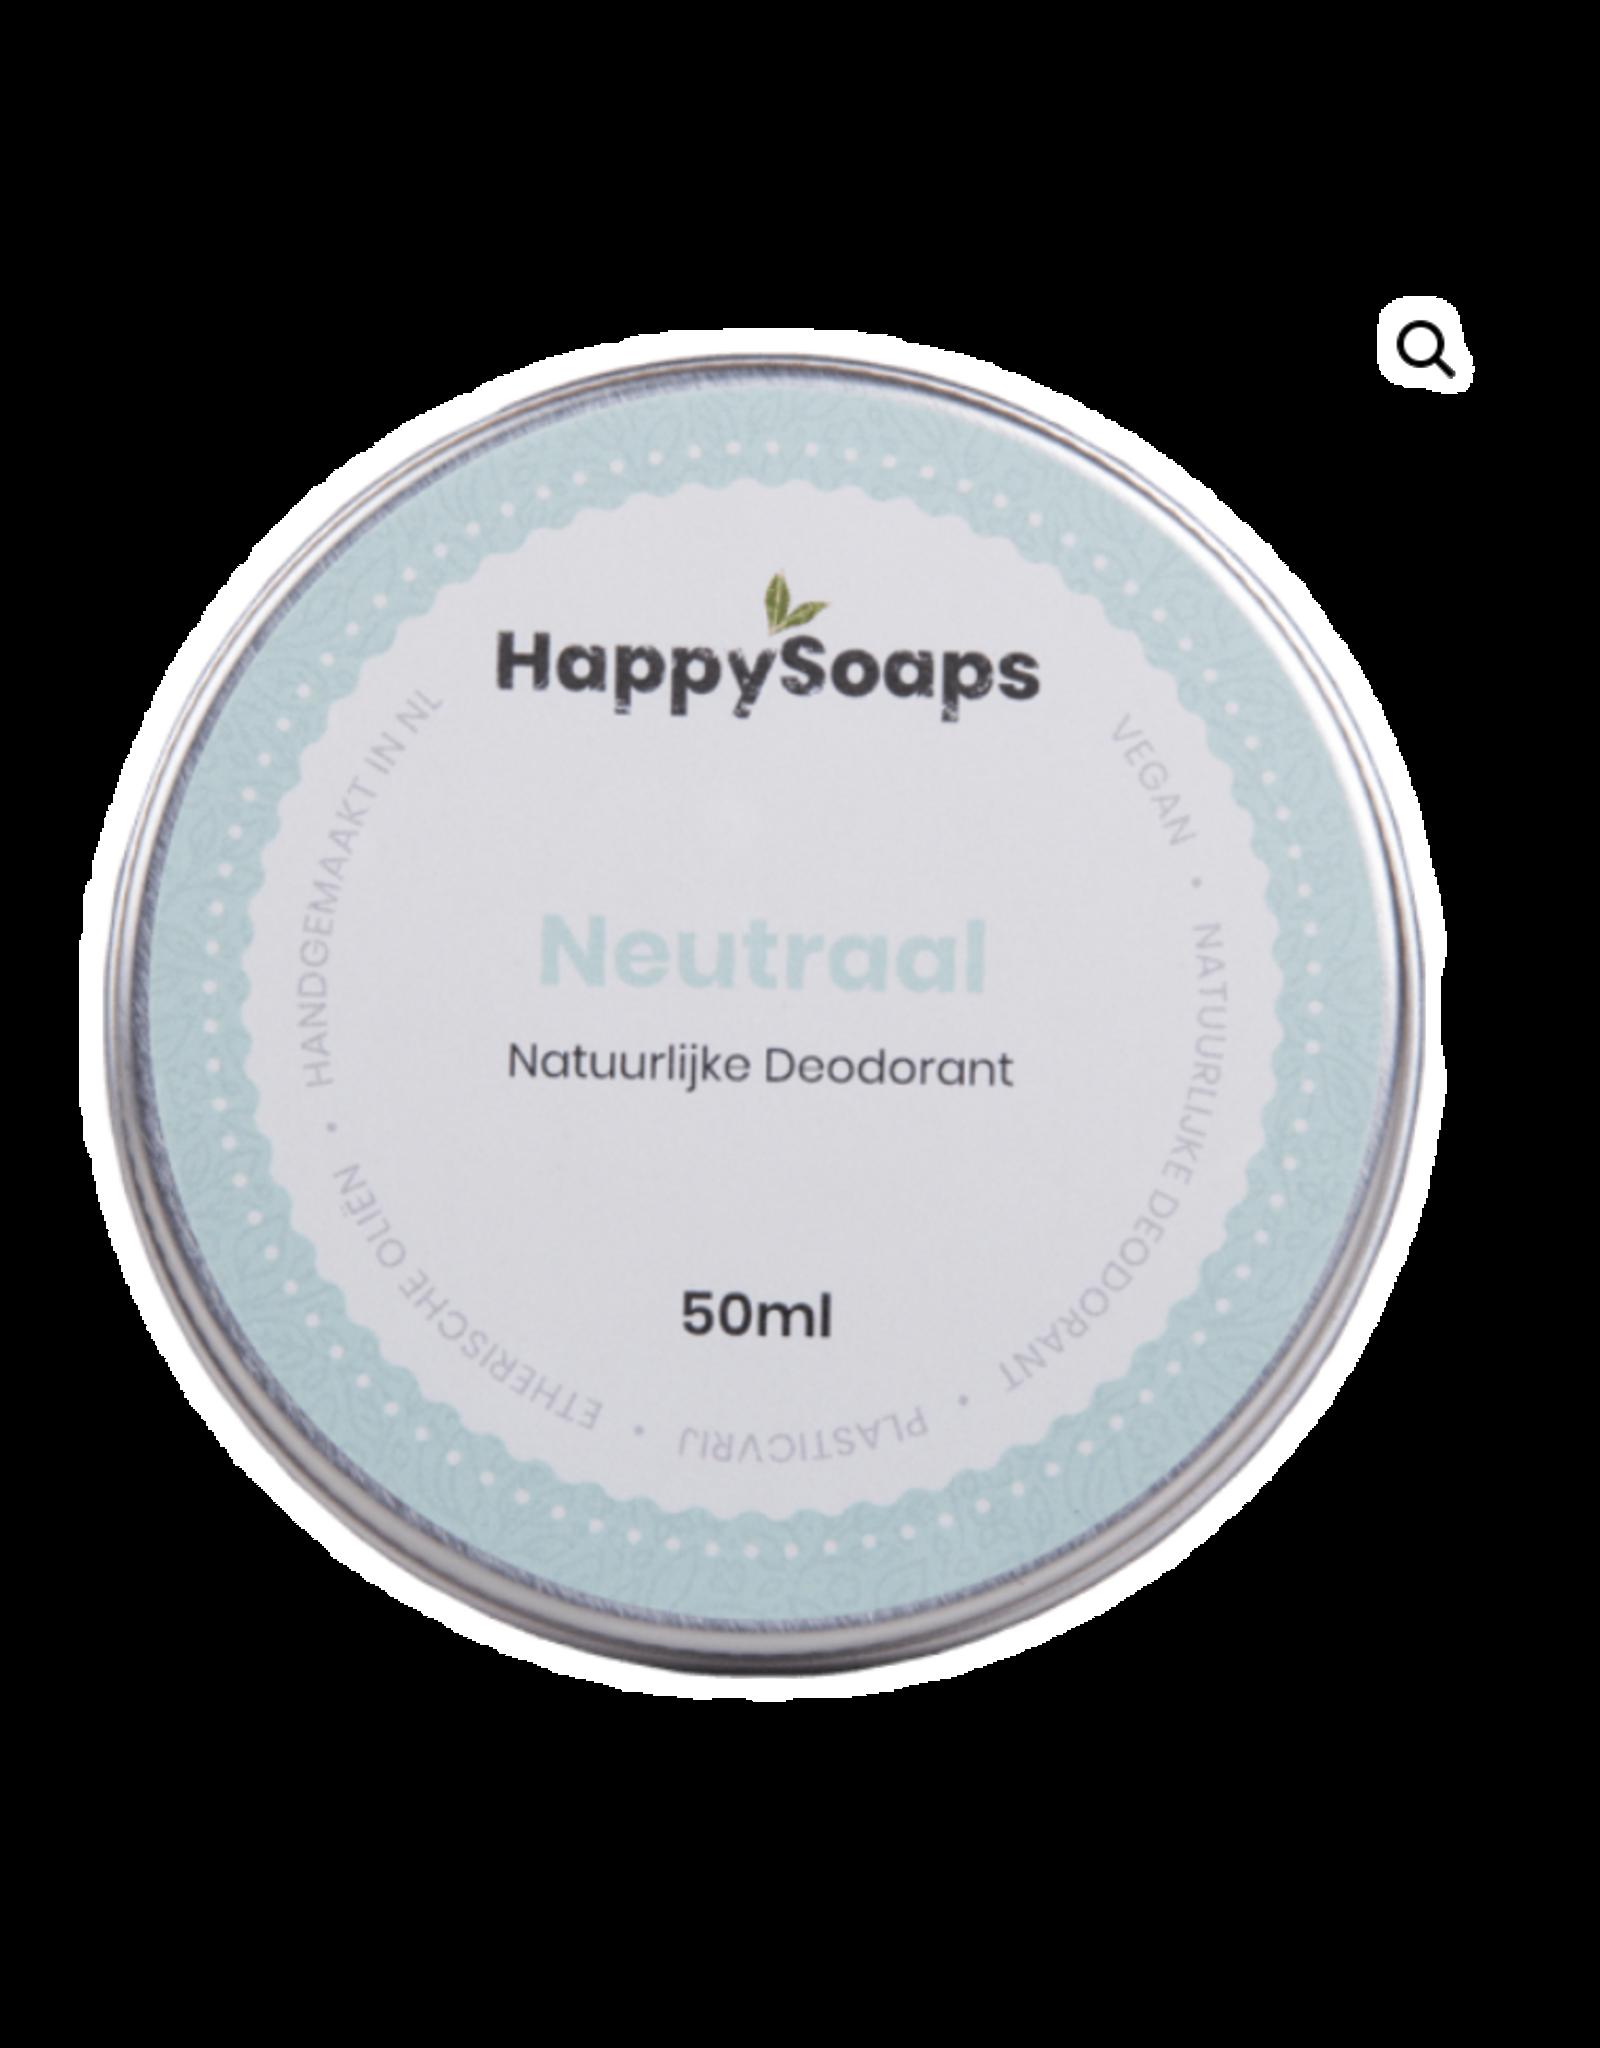 Natuurlijke Deodorant Neutraal- Body & Soap